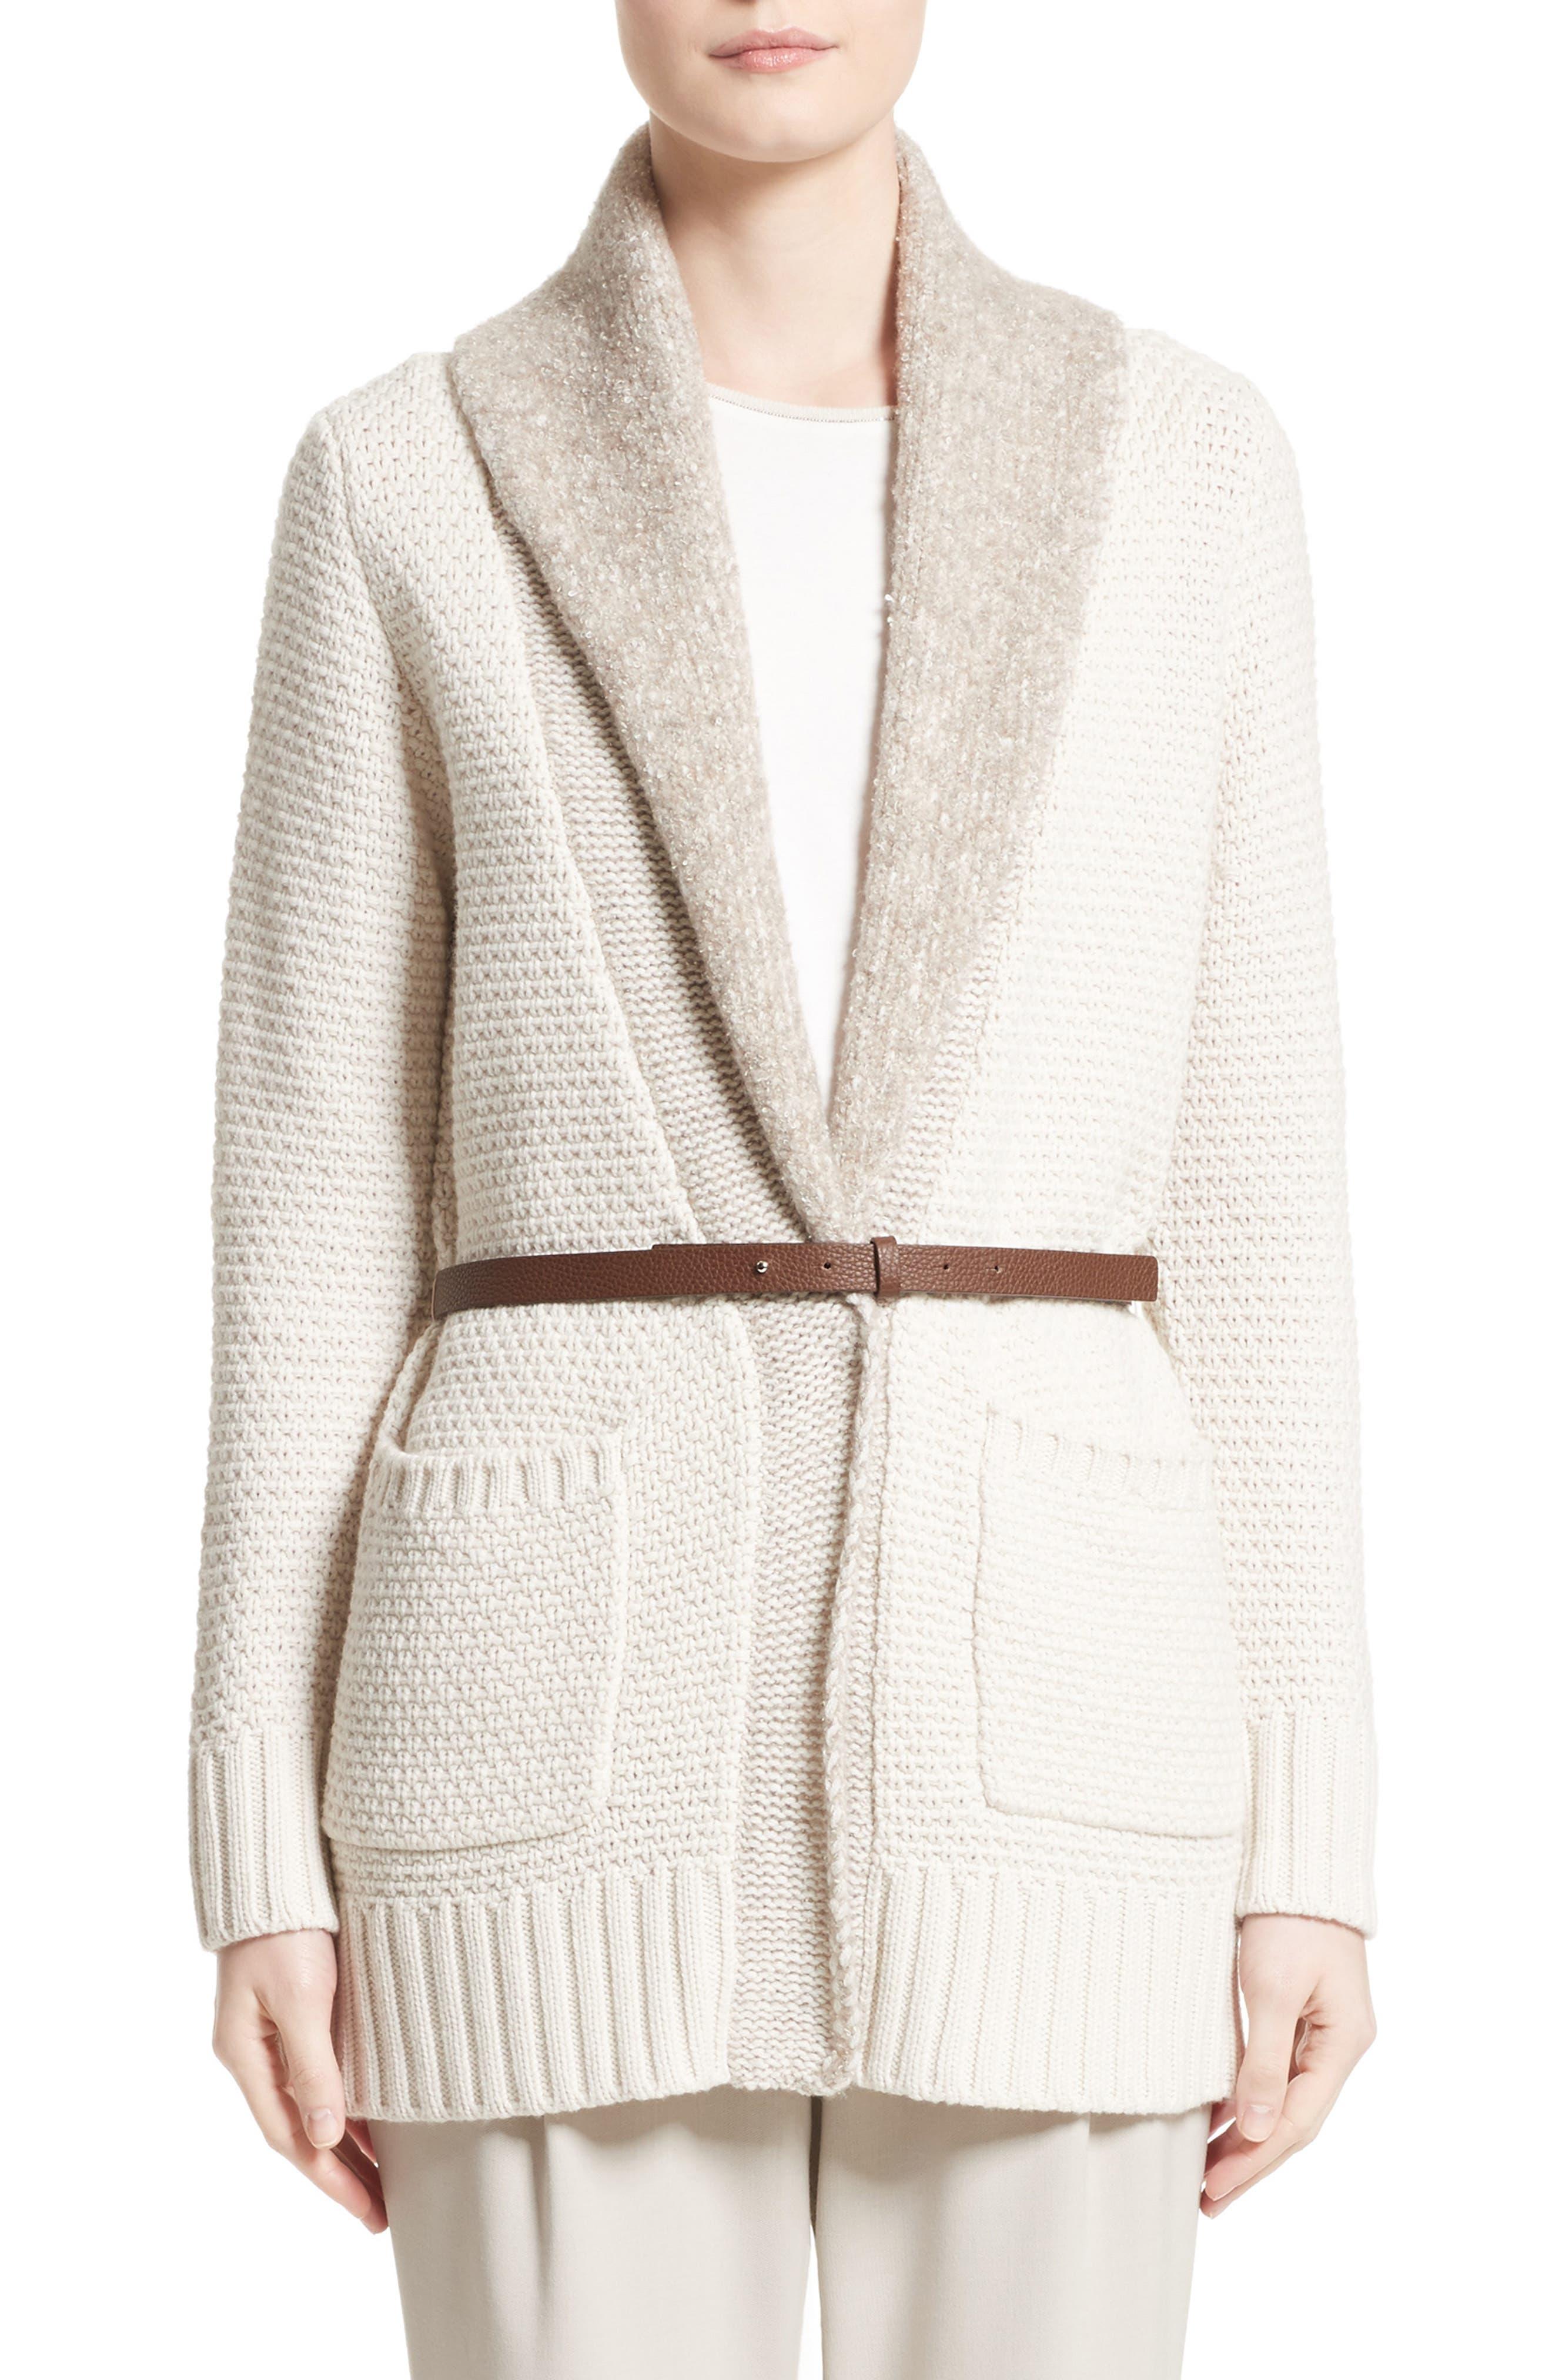 Main Image - Fabiana Filippi Wool, Silk & Cashmere Knit Cardigan